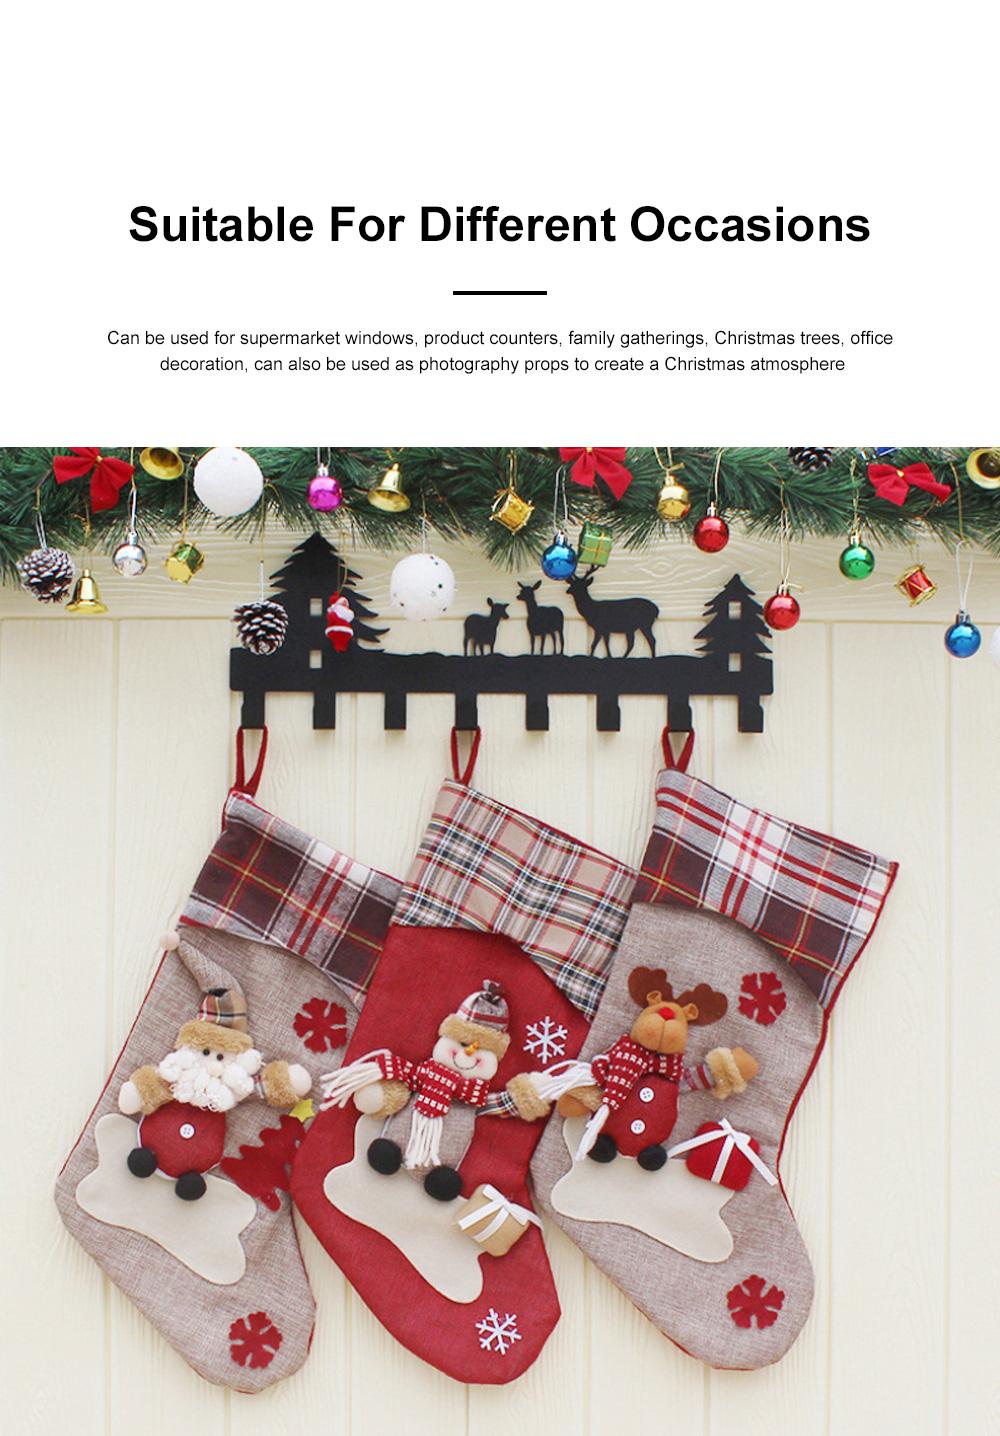 Christmas Decorations Santa Claus Snowman Socks High Quality Christmas Socks Christmas Gift Bags Decorative Gift Bags 1